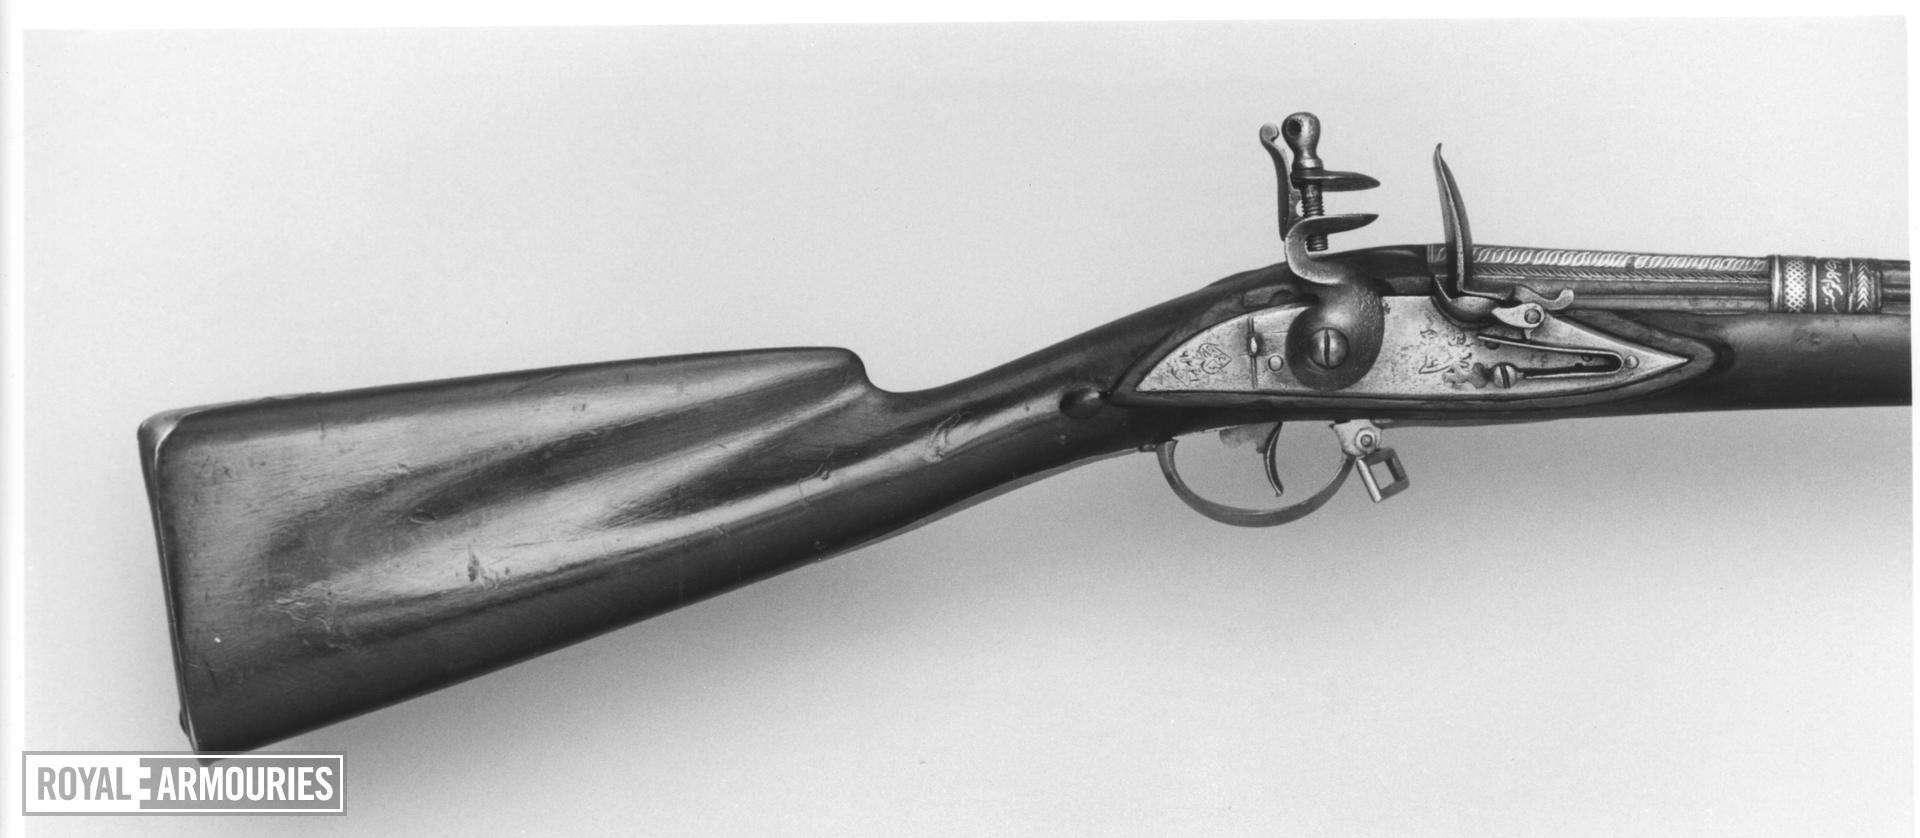 Flintlock sporting gun